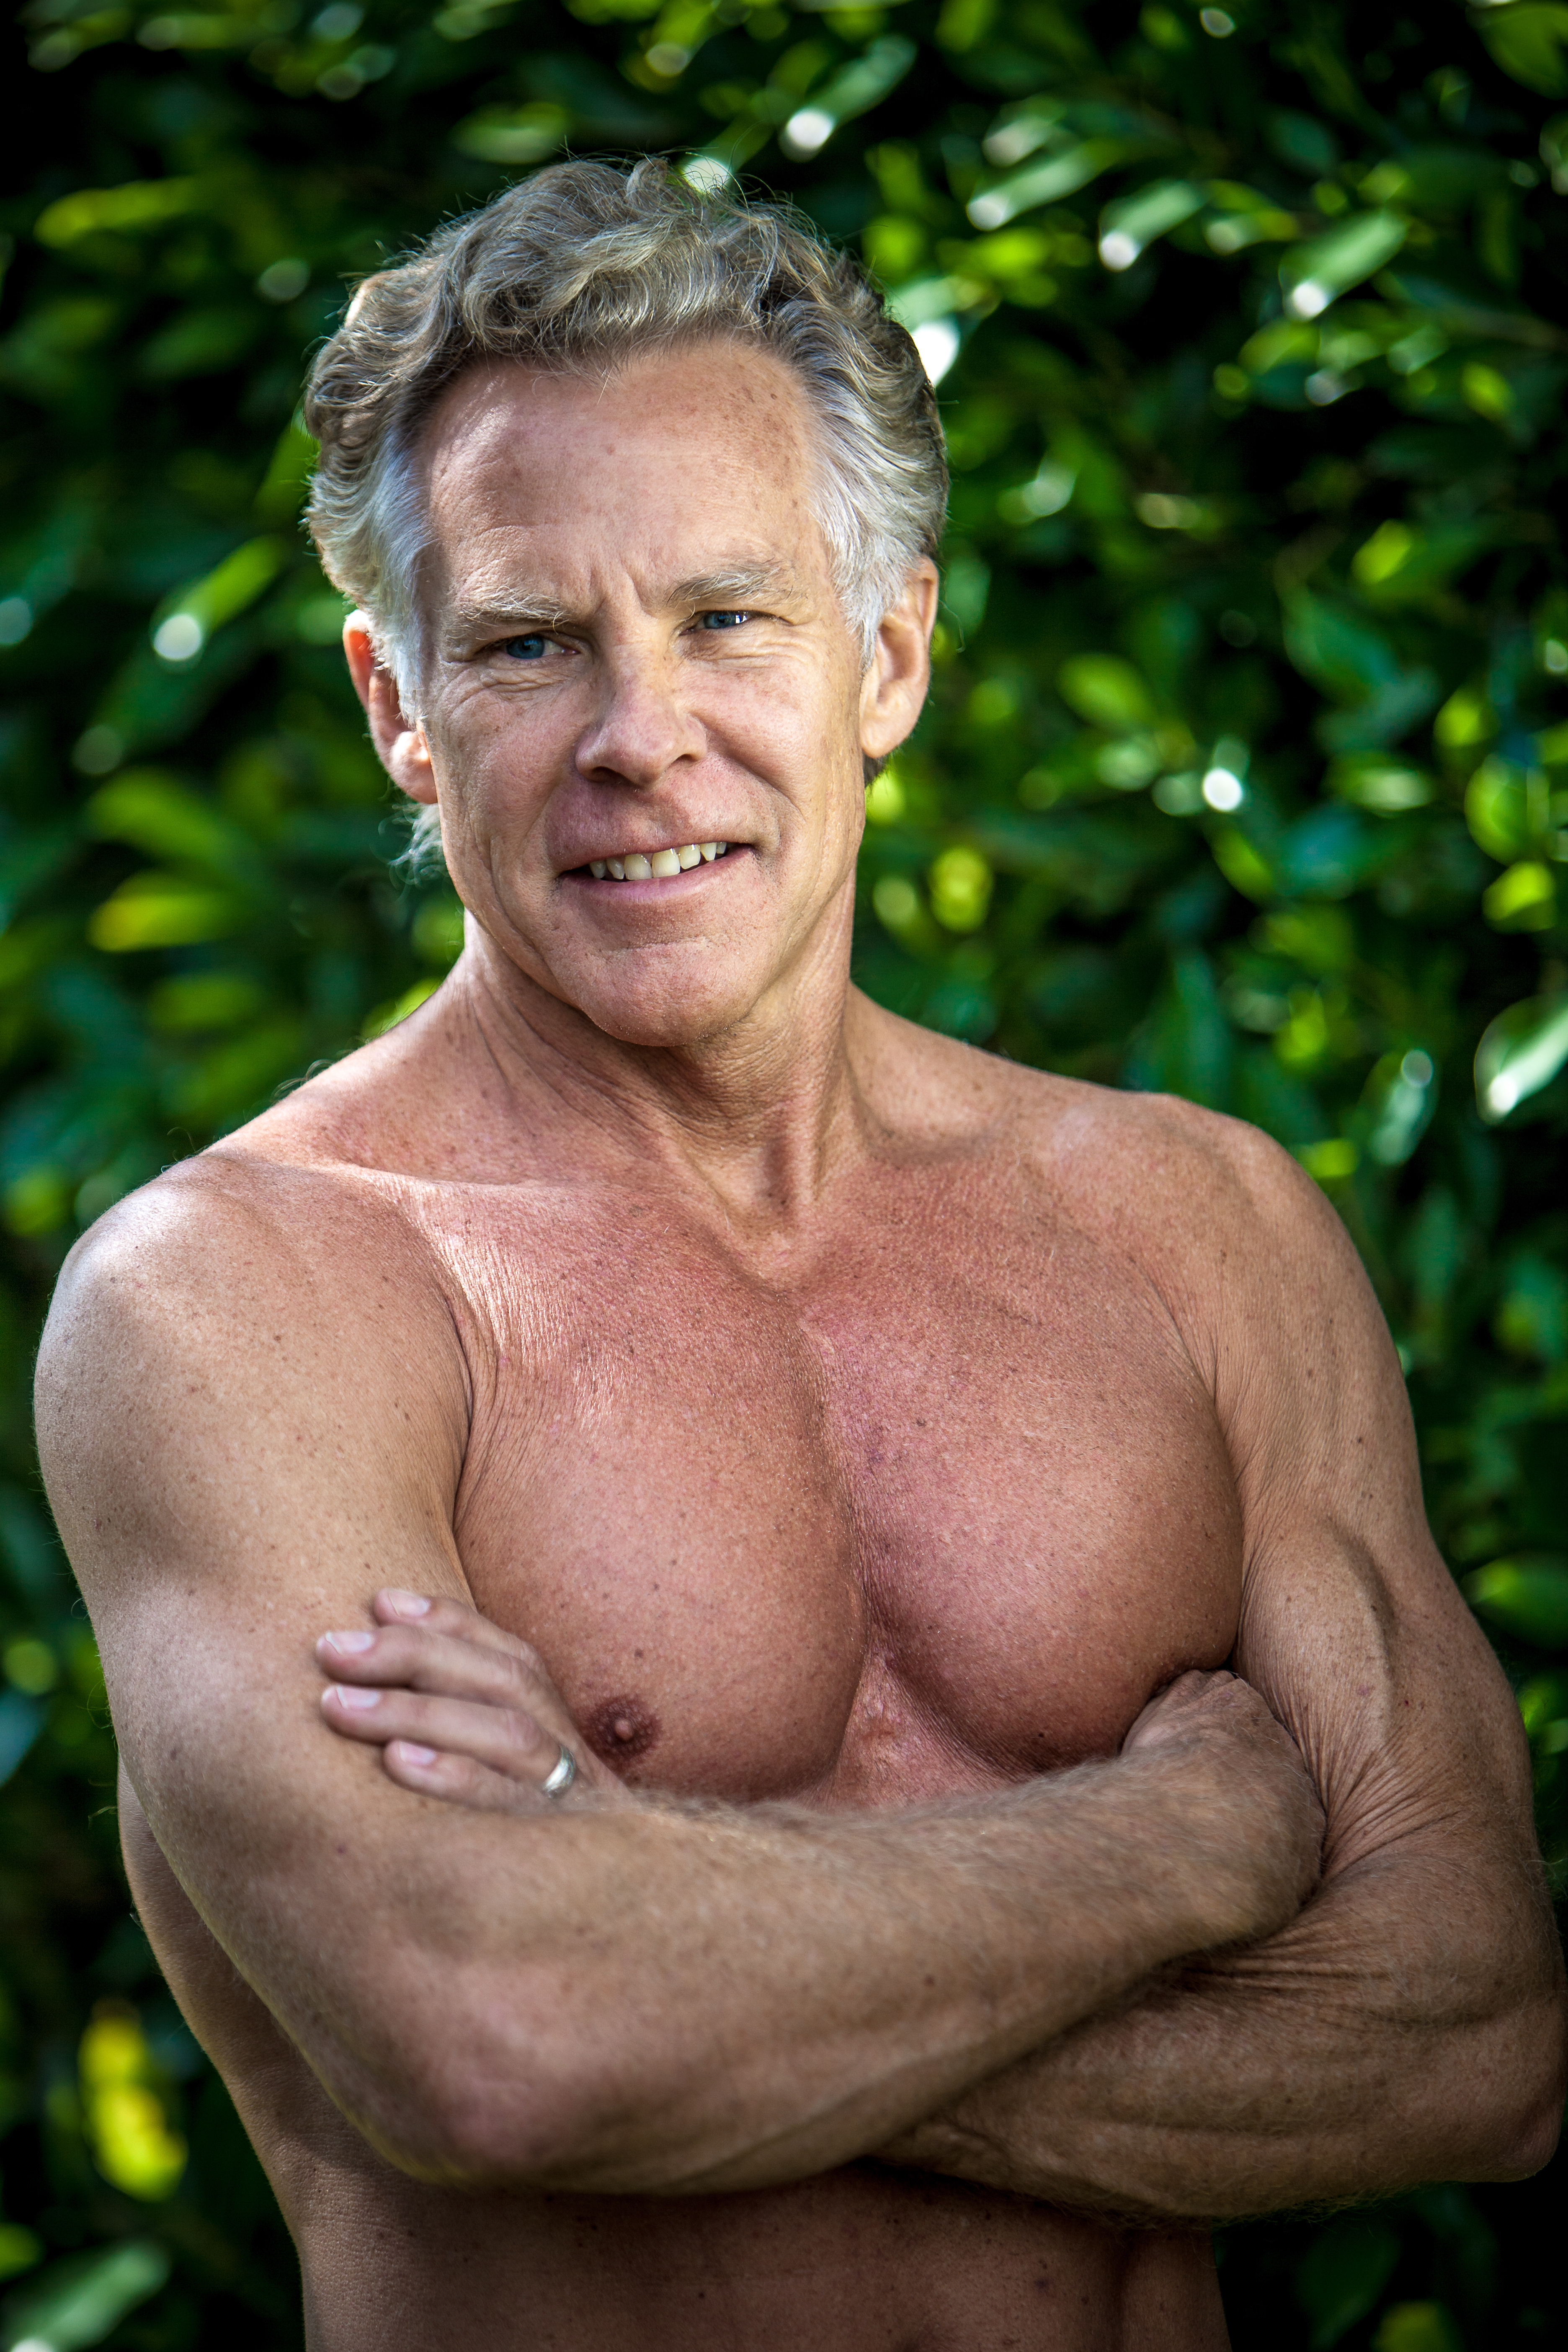 Mark Sisson 2015 mark sisson - alchetron, the free social encyclopedia